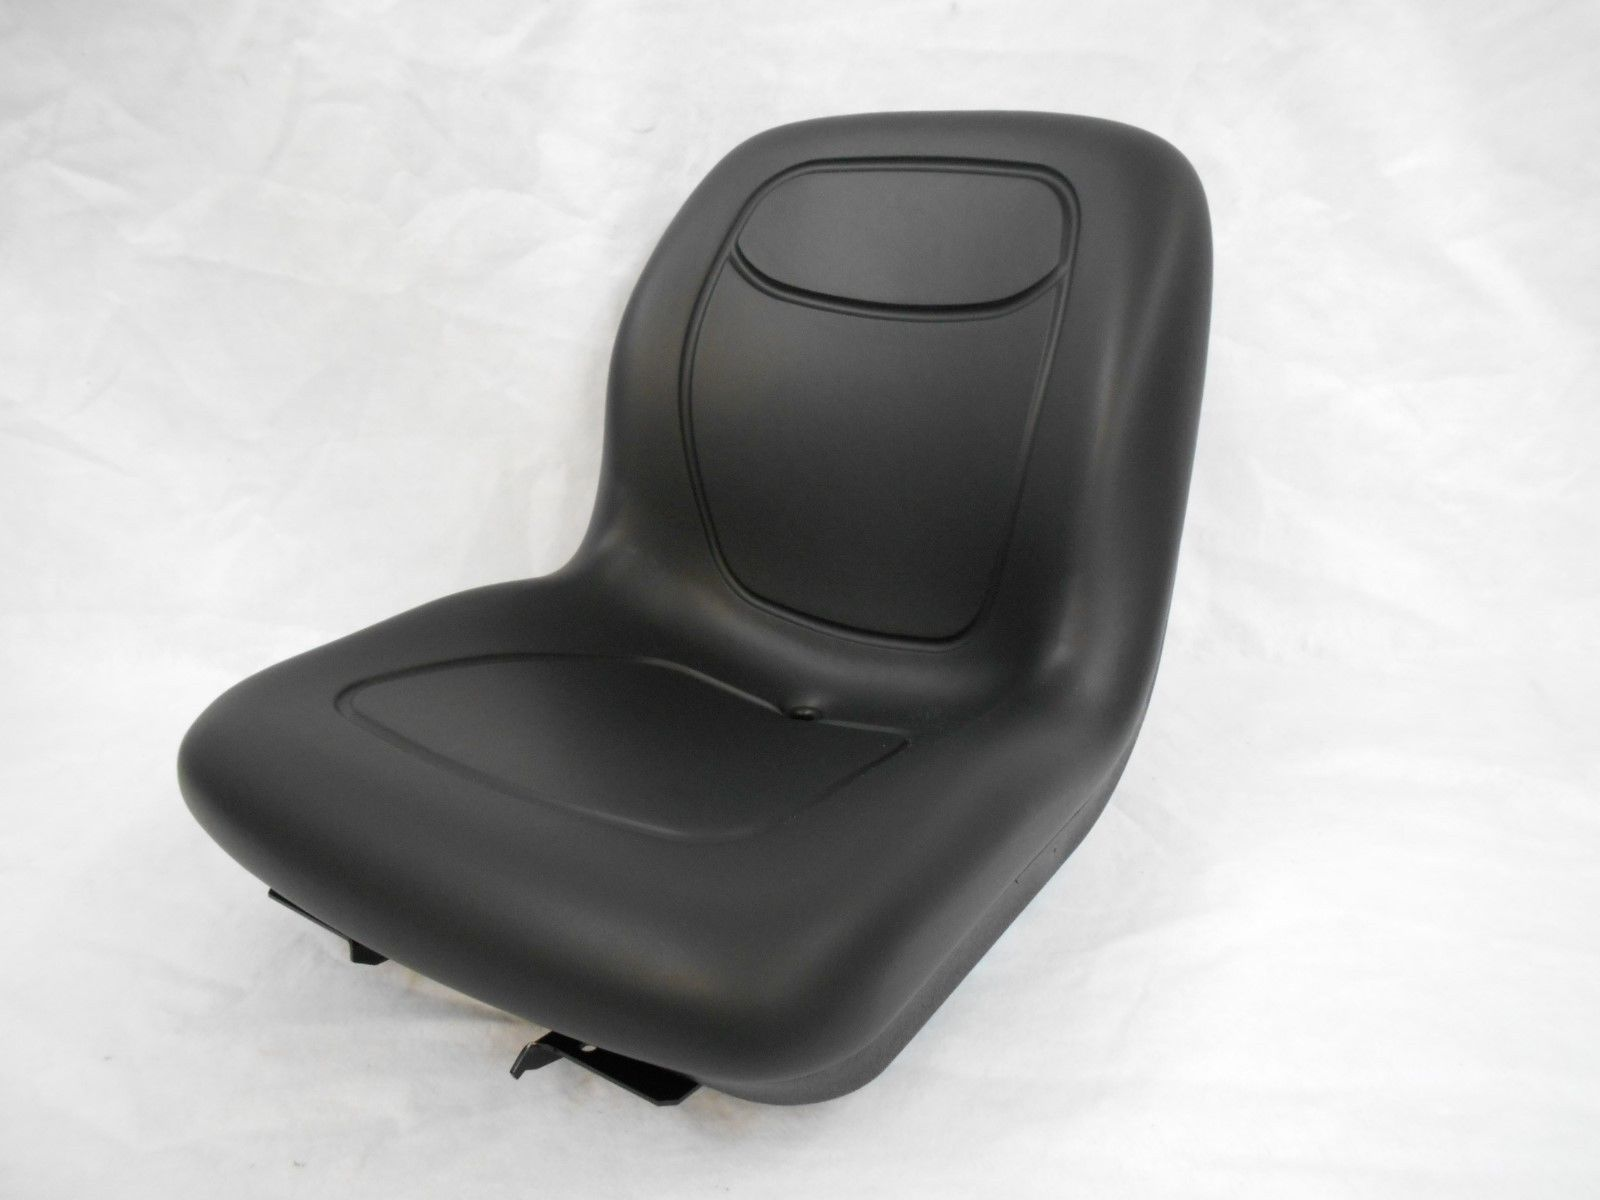 Mahindra 2216 Wiring Diagram Diagrams Data Base 450 2816 Seat Fits 2516 Rh Viabit Pro On Bobcat